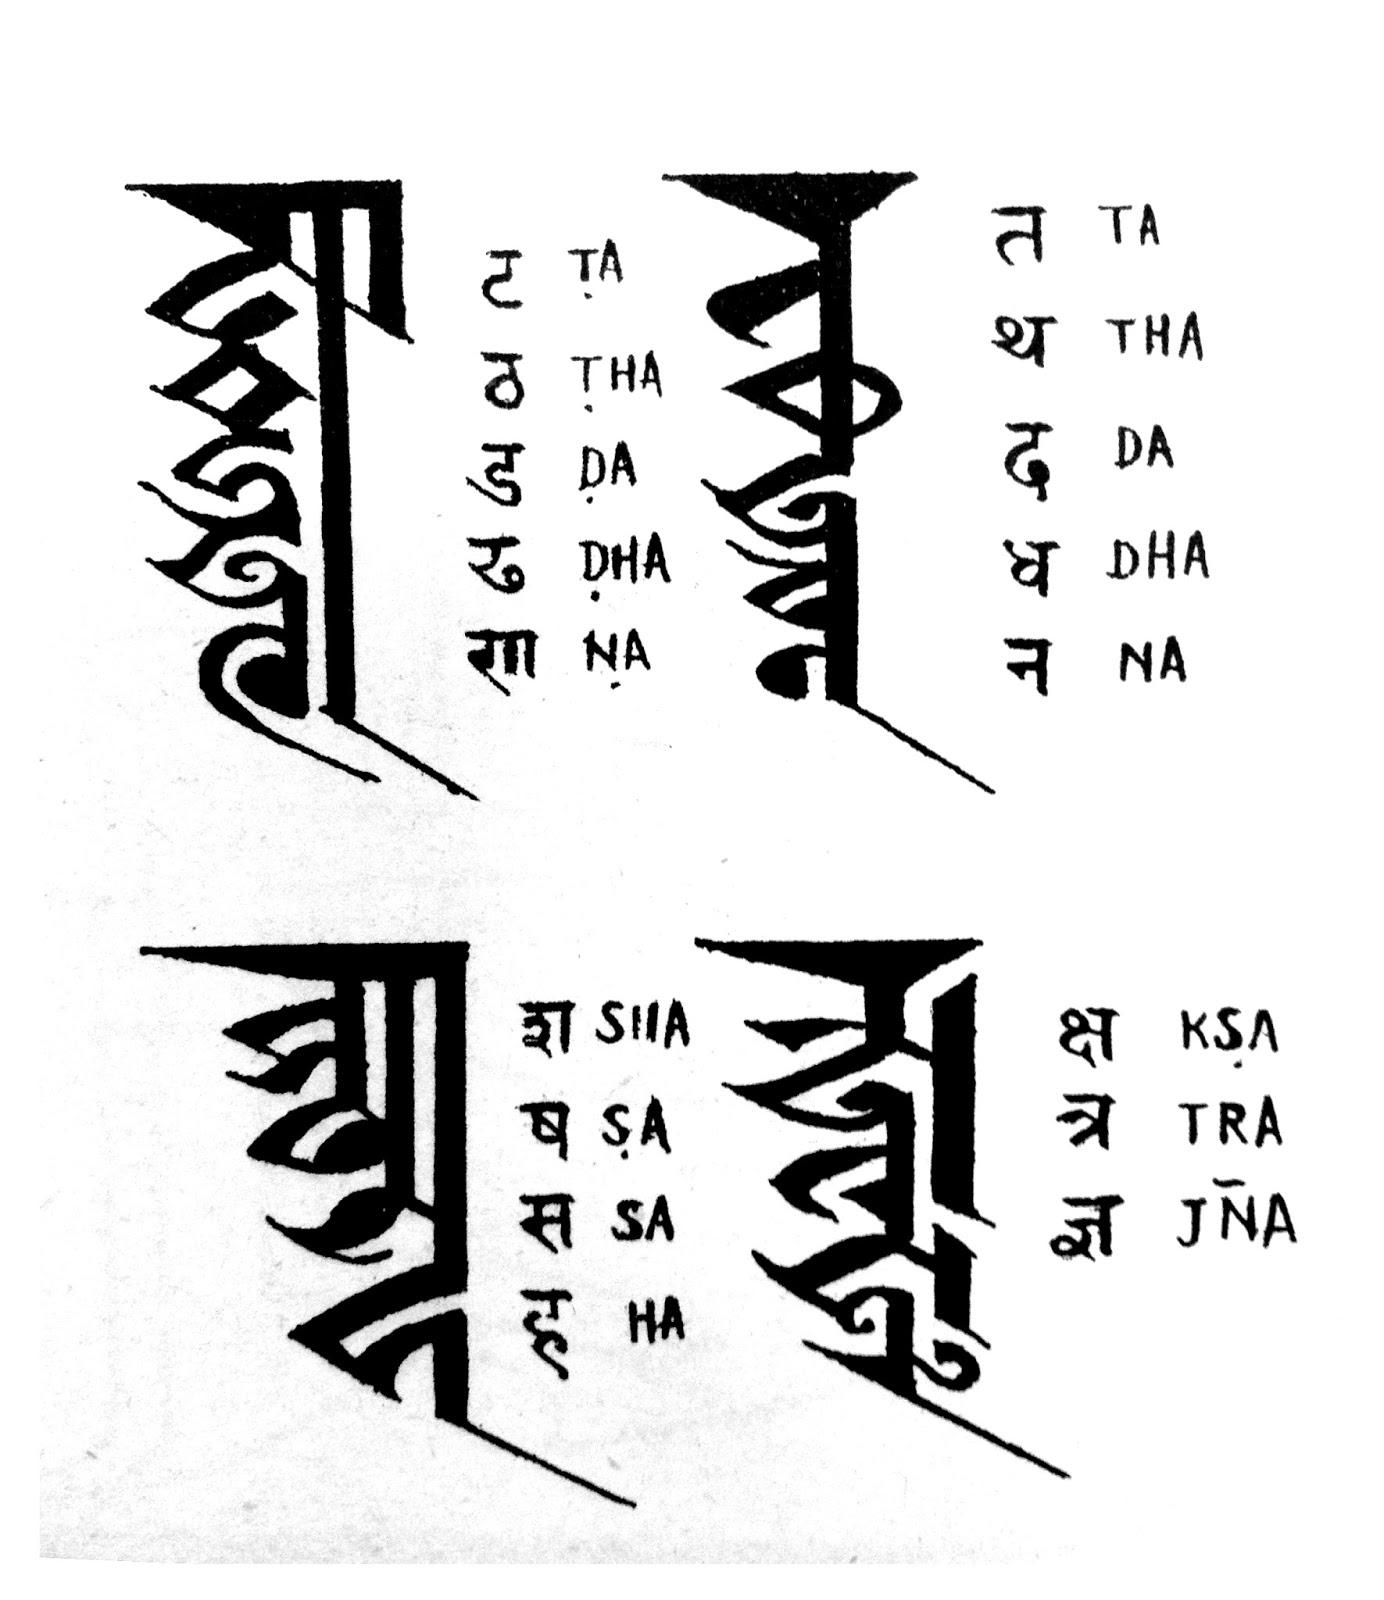 New nepali fonts kutakshar monogram script nepal kutakshar monogram script nepal bhasa newa lipi ranjana altavistaventures Images